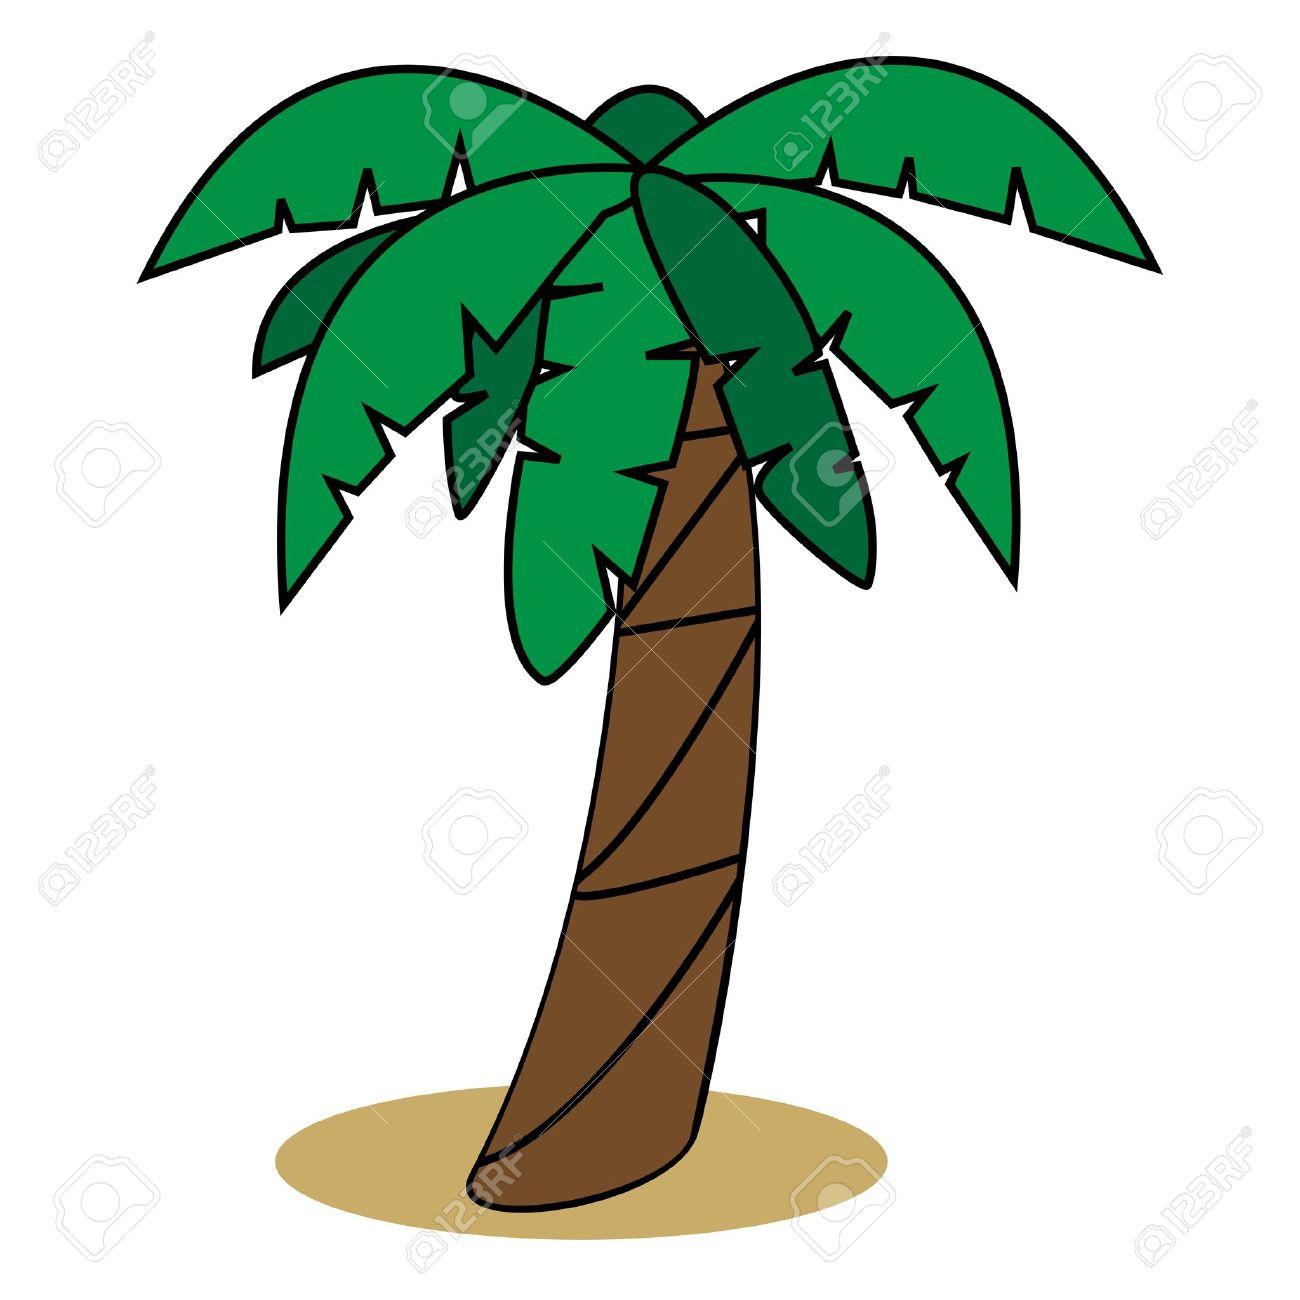 1300x1300 Palm Tree Cartoon Drawing Graphic Illustration Of Palm Tree